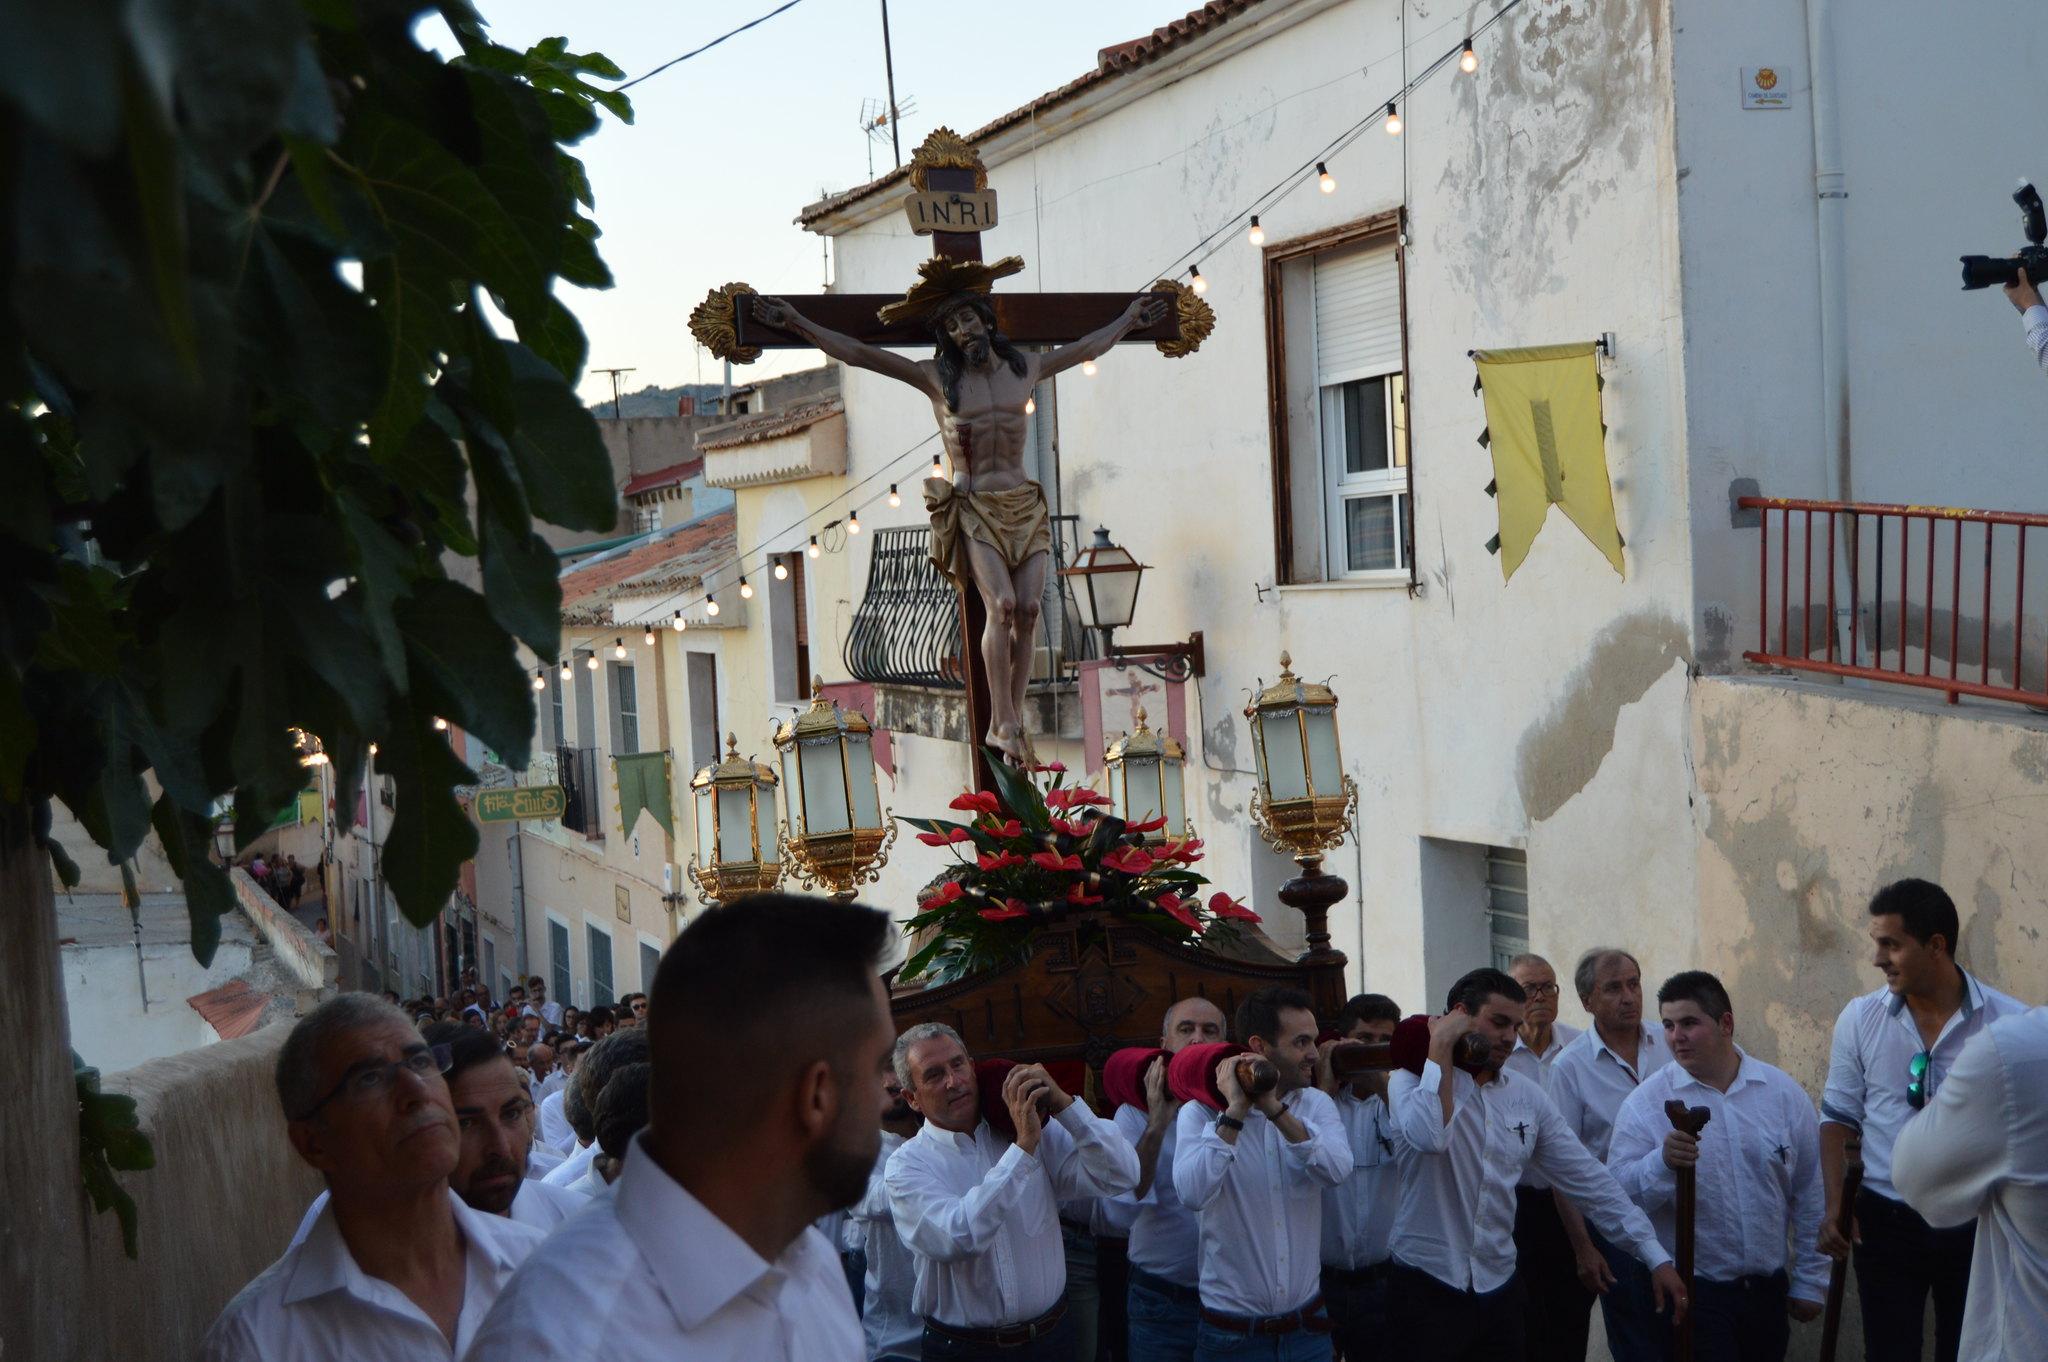 (2017-07-02) Procesión de subida (Adrián Romero Montesinos) (100)